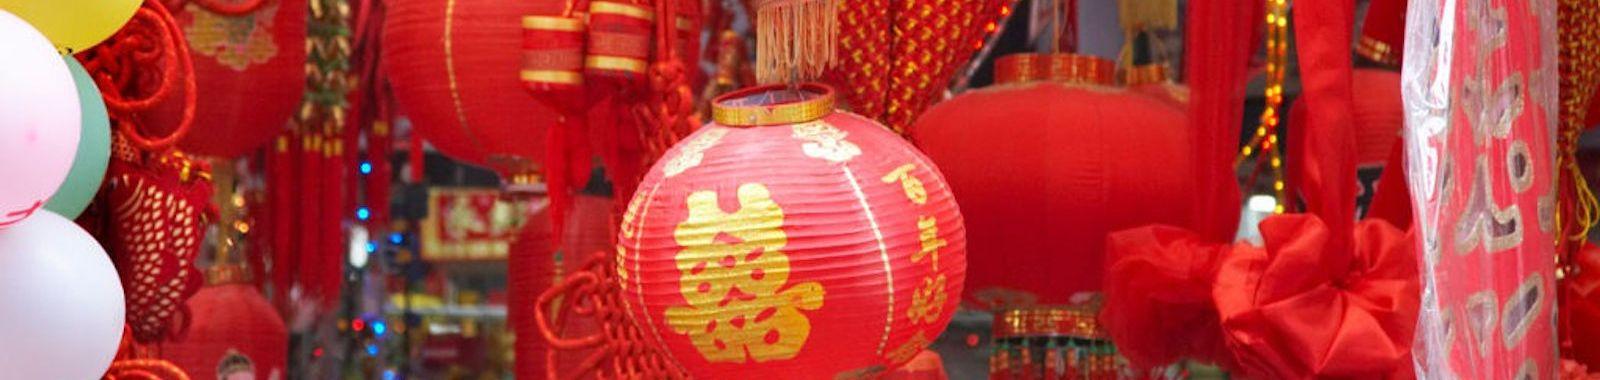 China_hotels_lanterns_eye